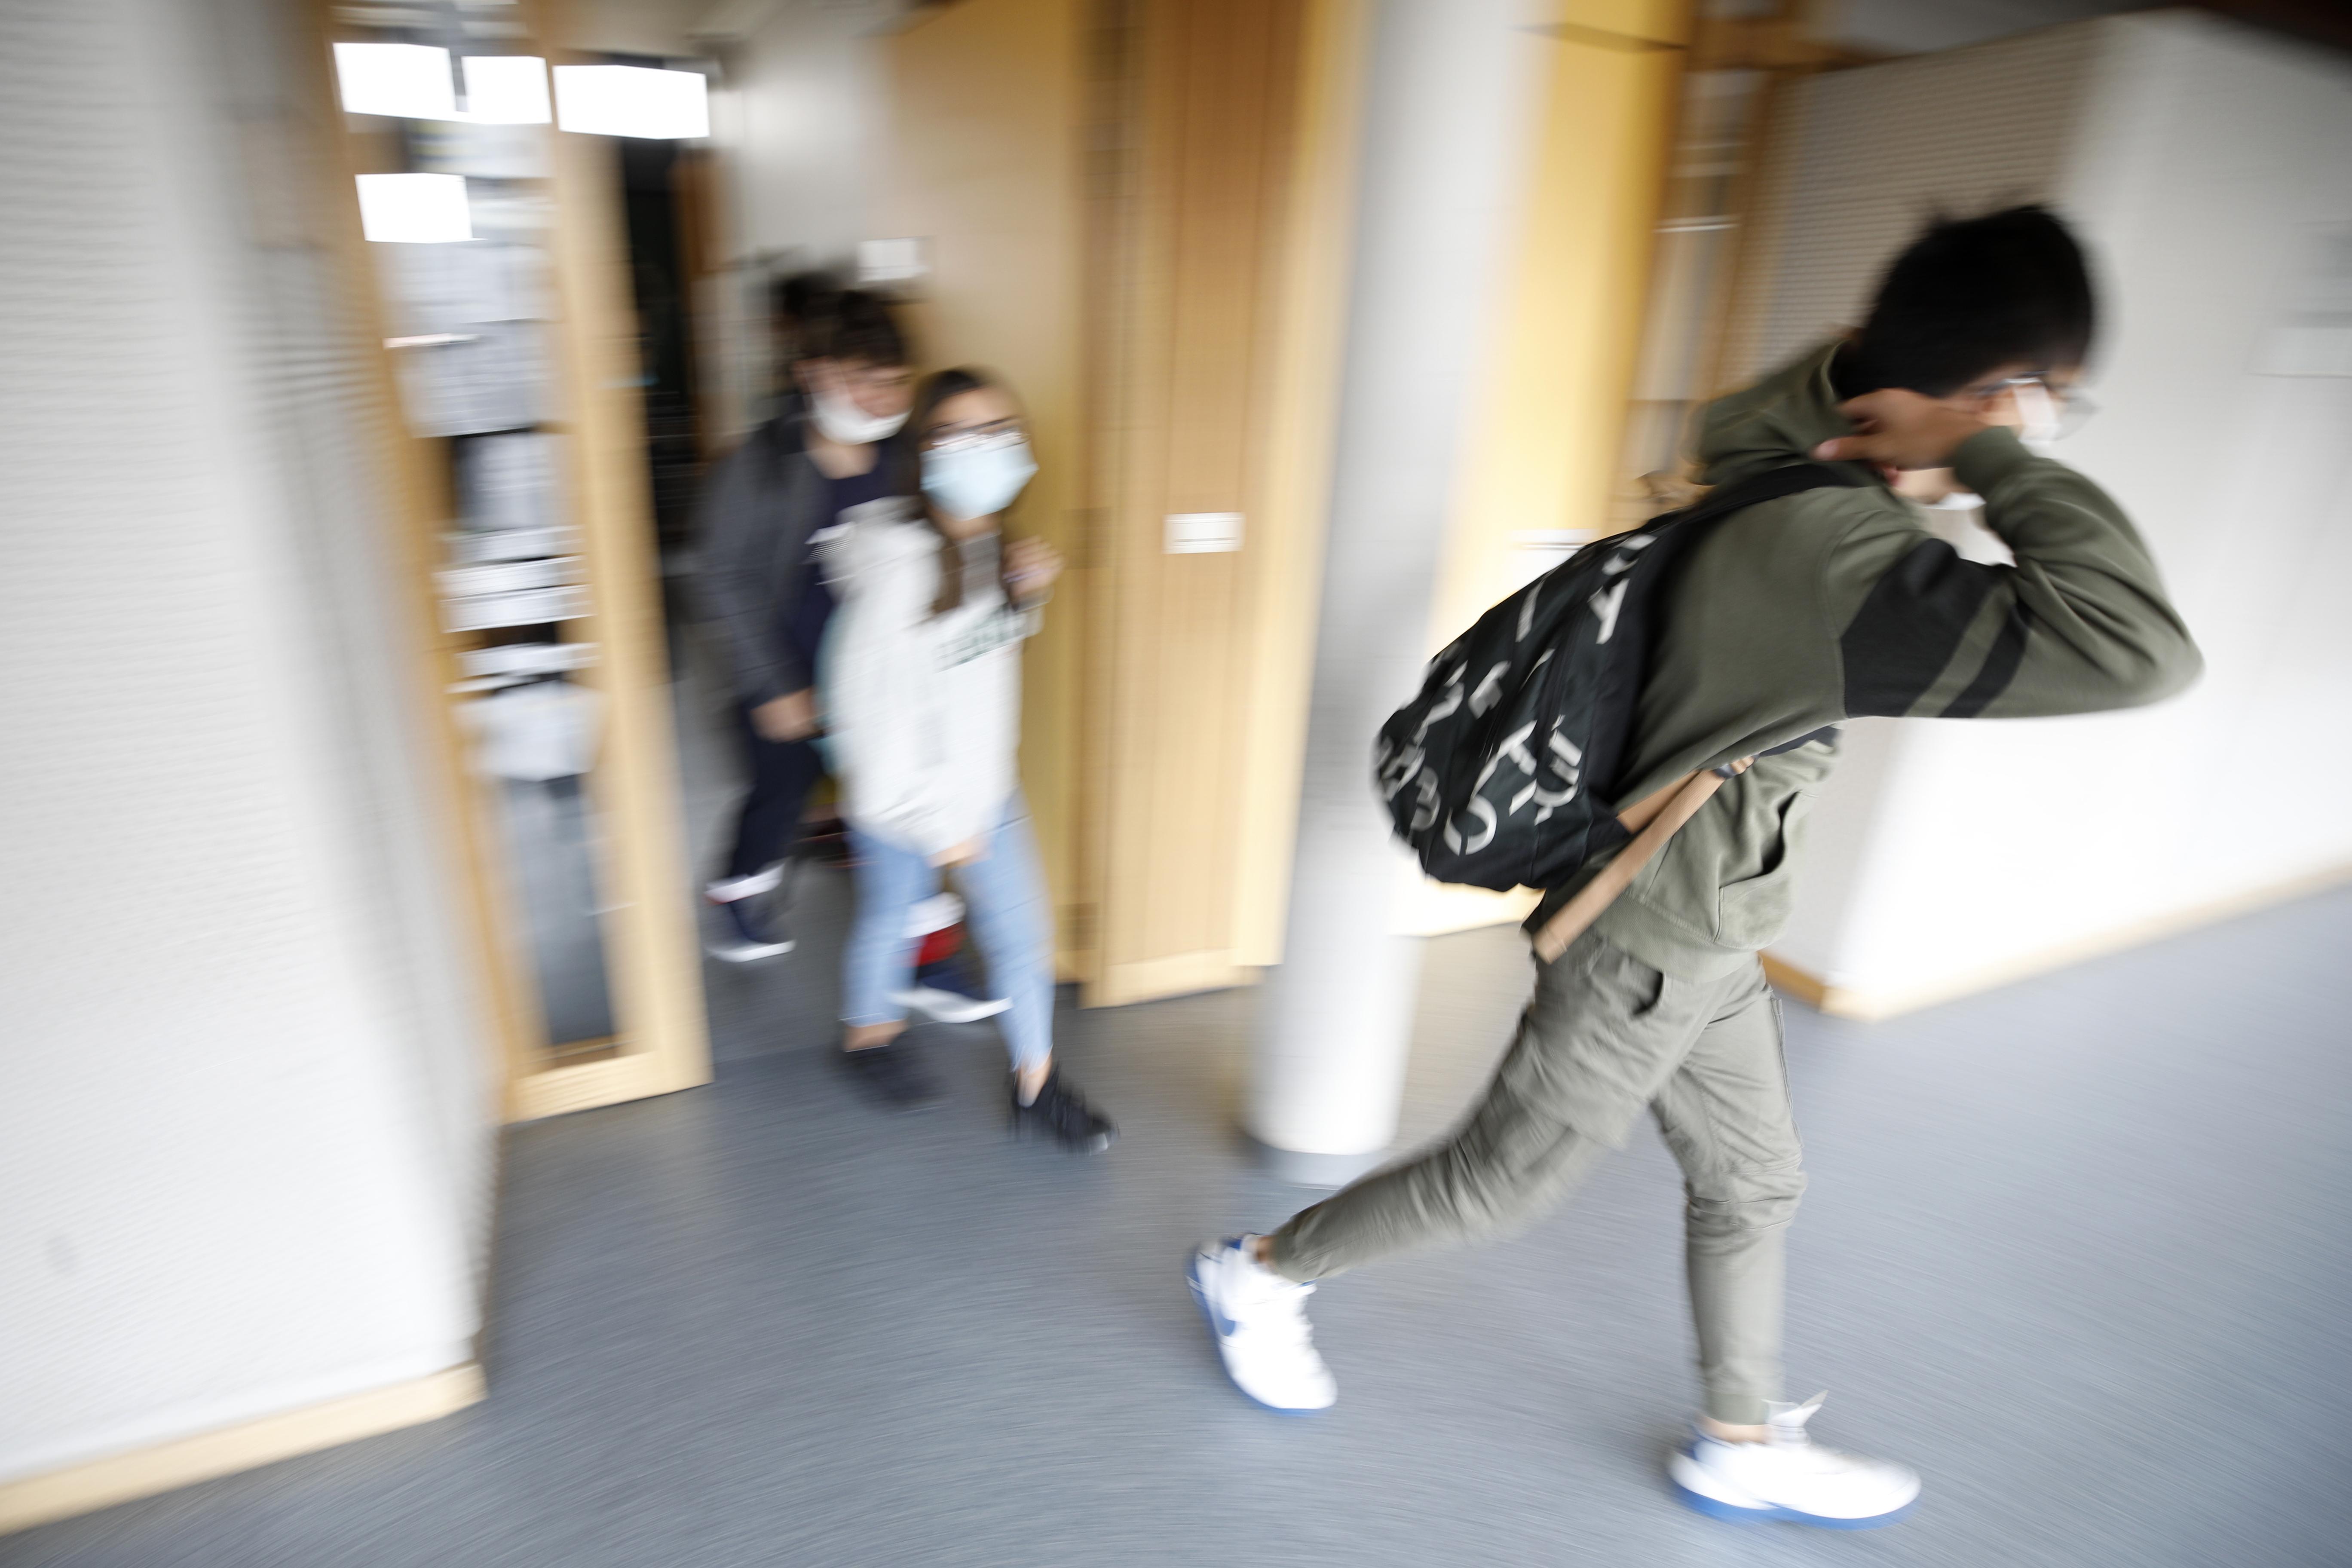 Scuola, AP Photo/Jean-Francois Badias